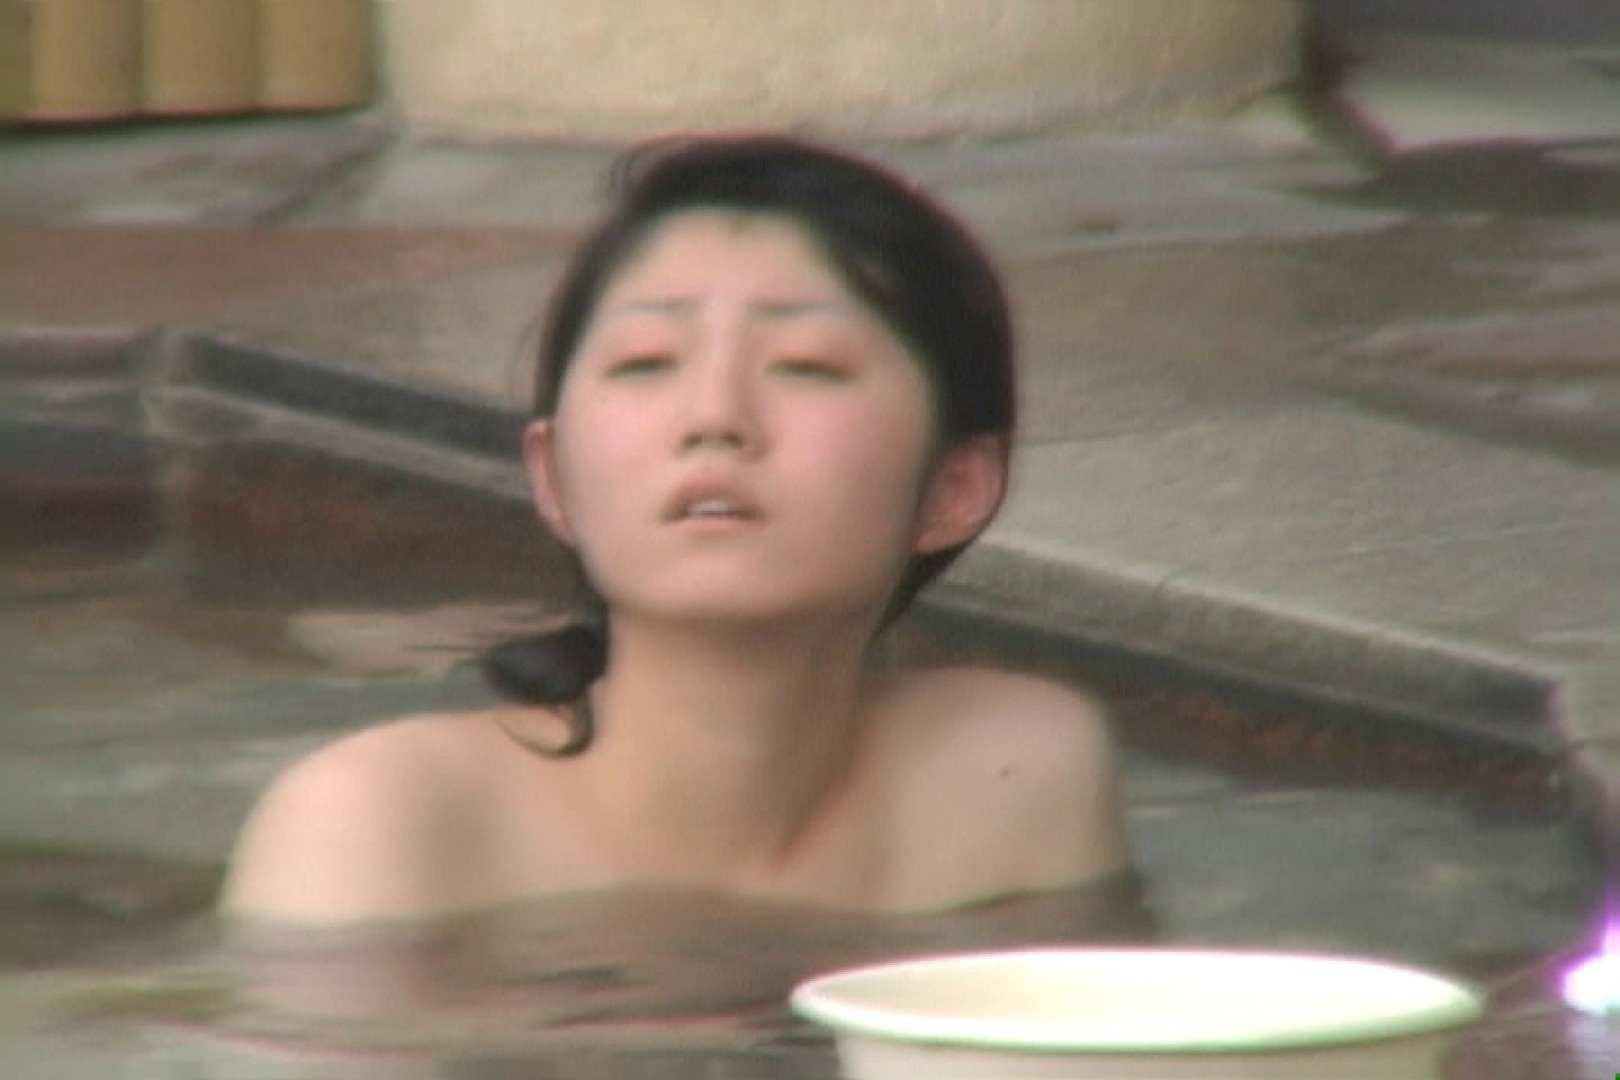 Aquaな露天風呂Vol.579 OL女体 | 露天  72連発 37